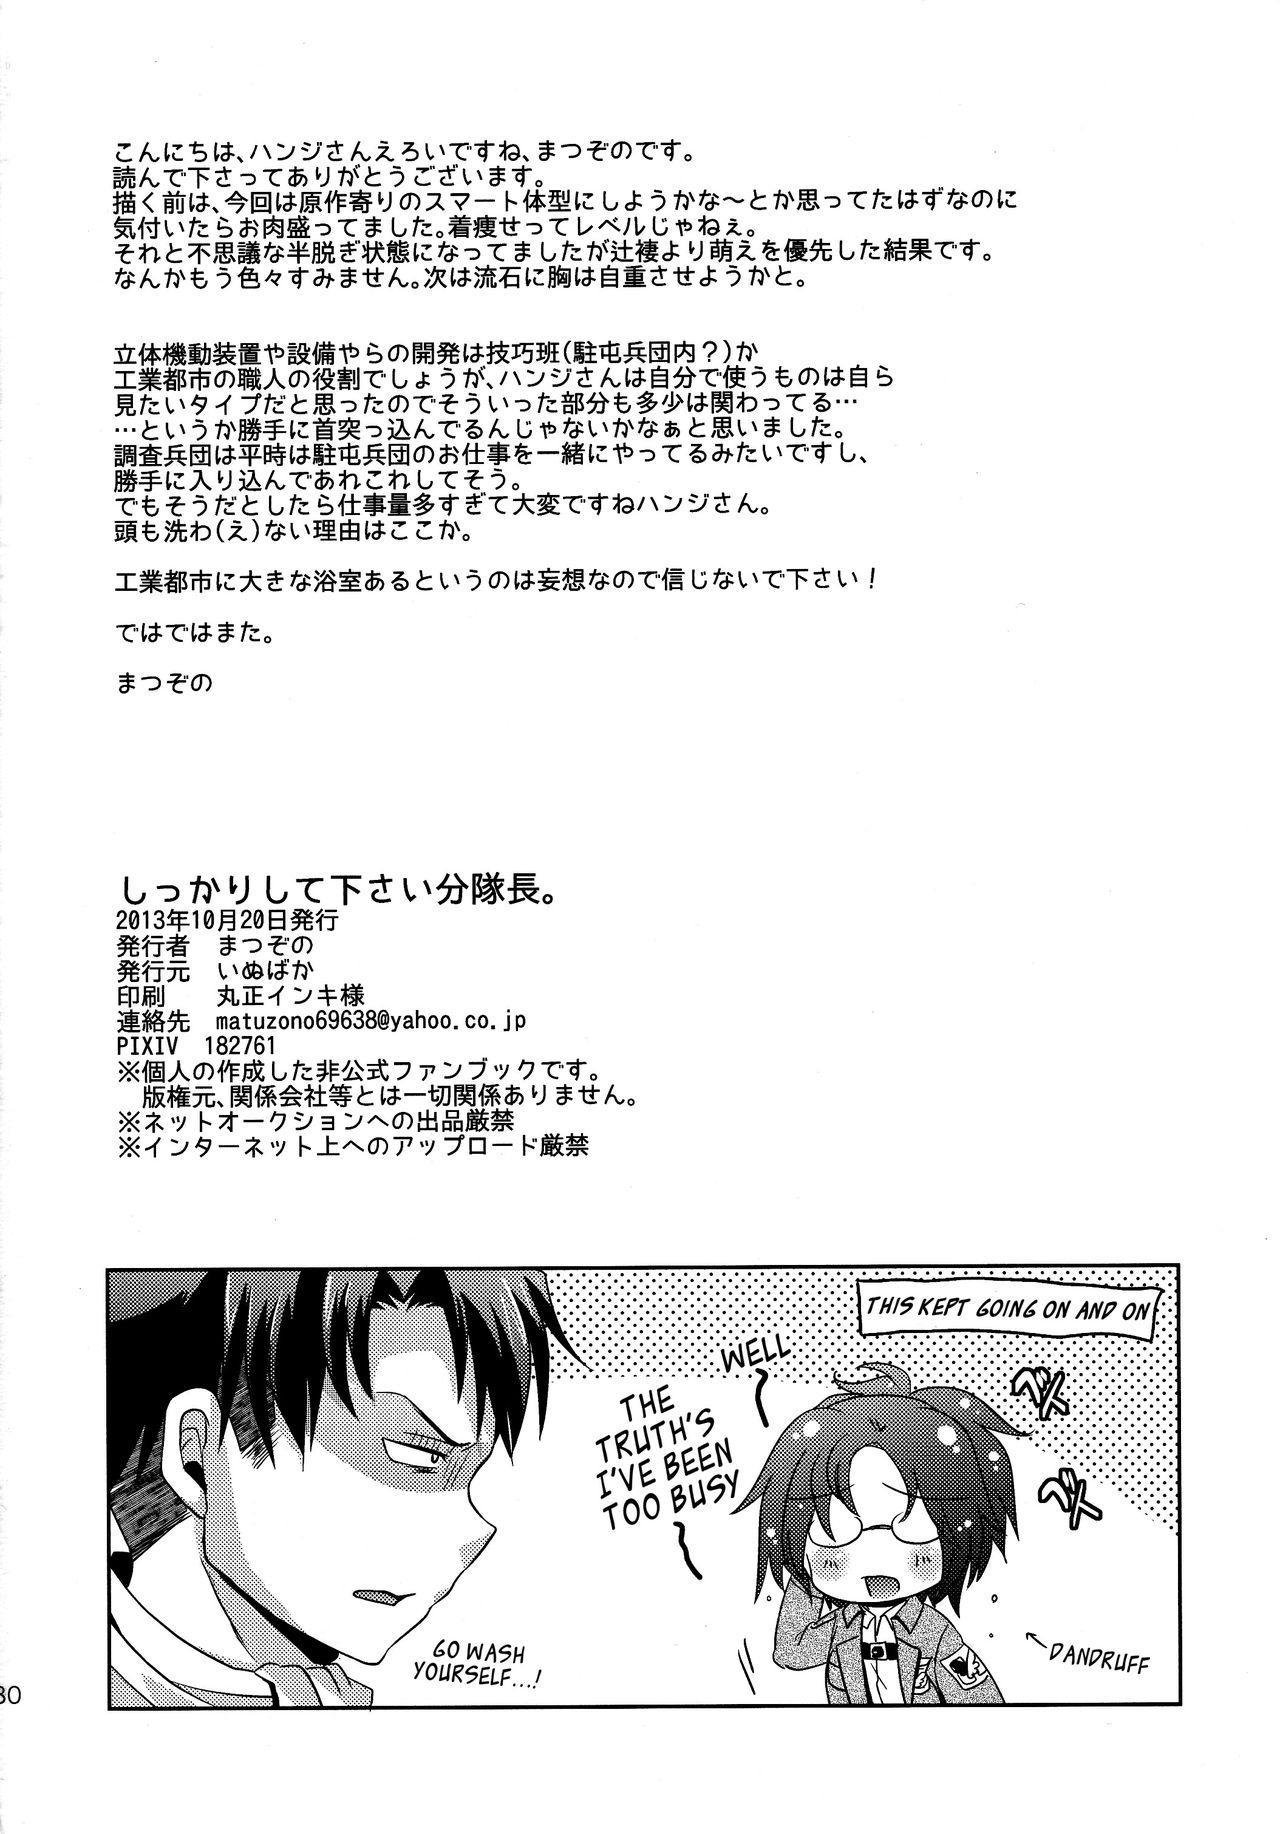 Shikkari shite kudasai Buntaichou. | Please take this seriously, Squad Leader. 29